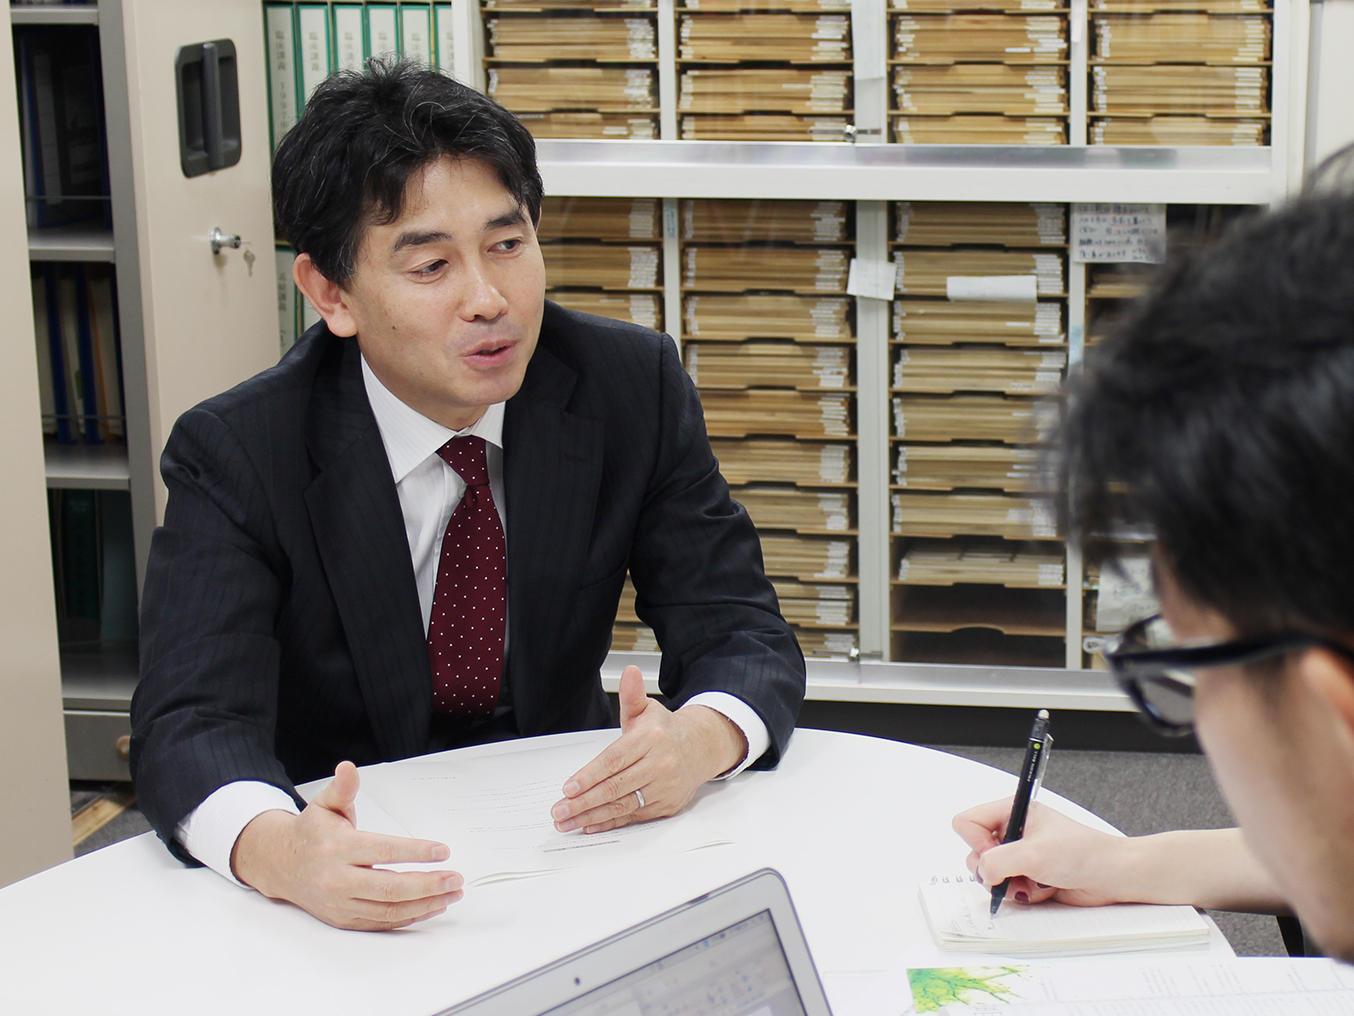 NewsPicks 朝日新聞公式連載『国立大学が創る未来』の取材を受けました